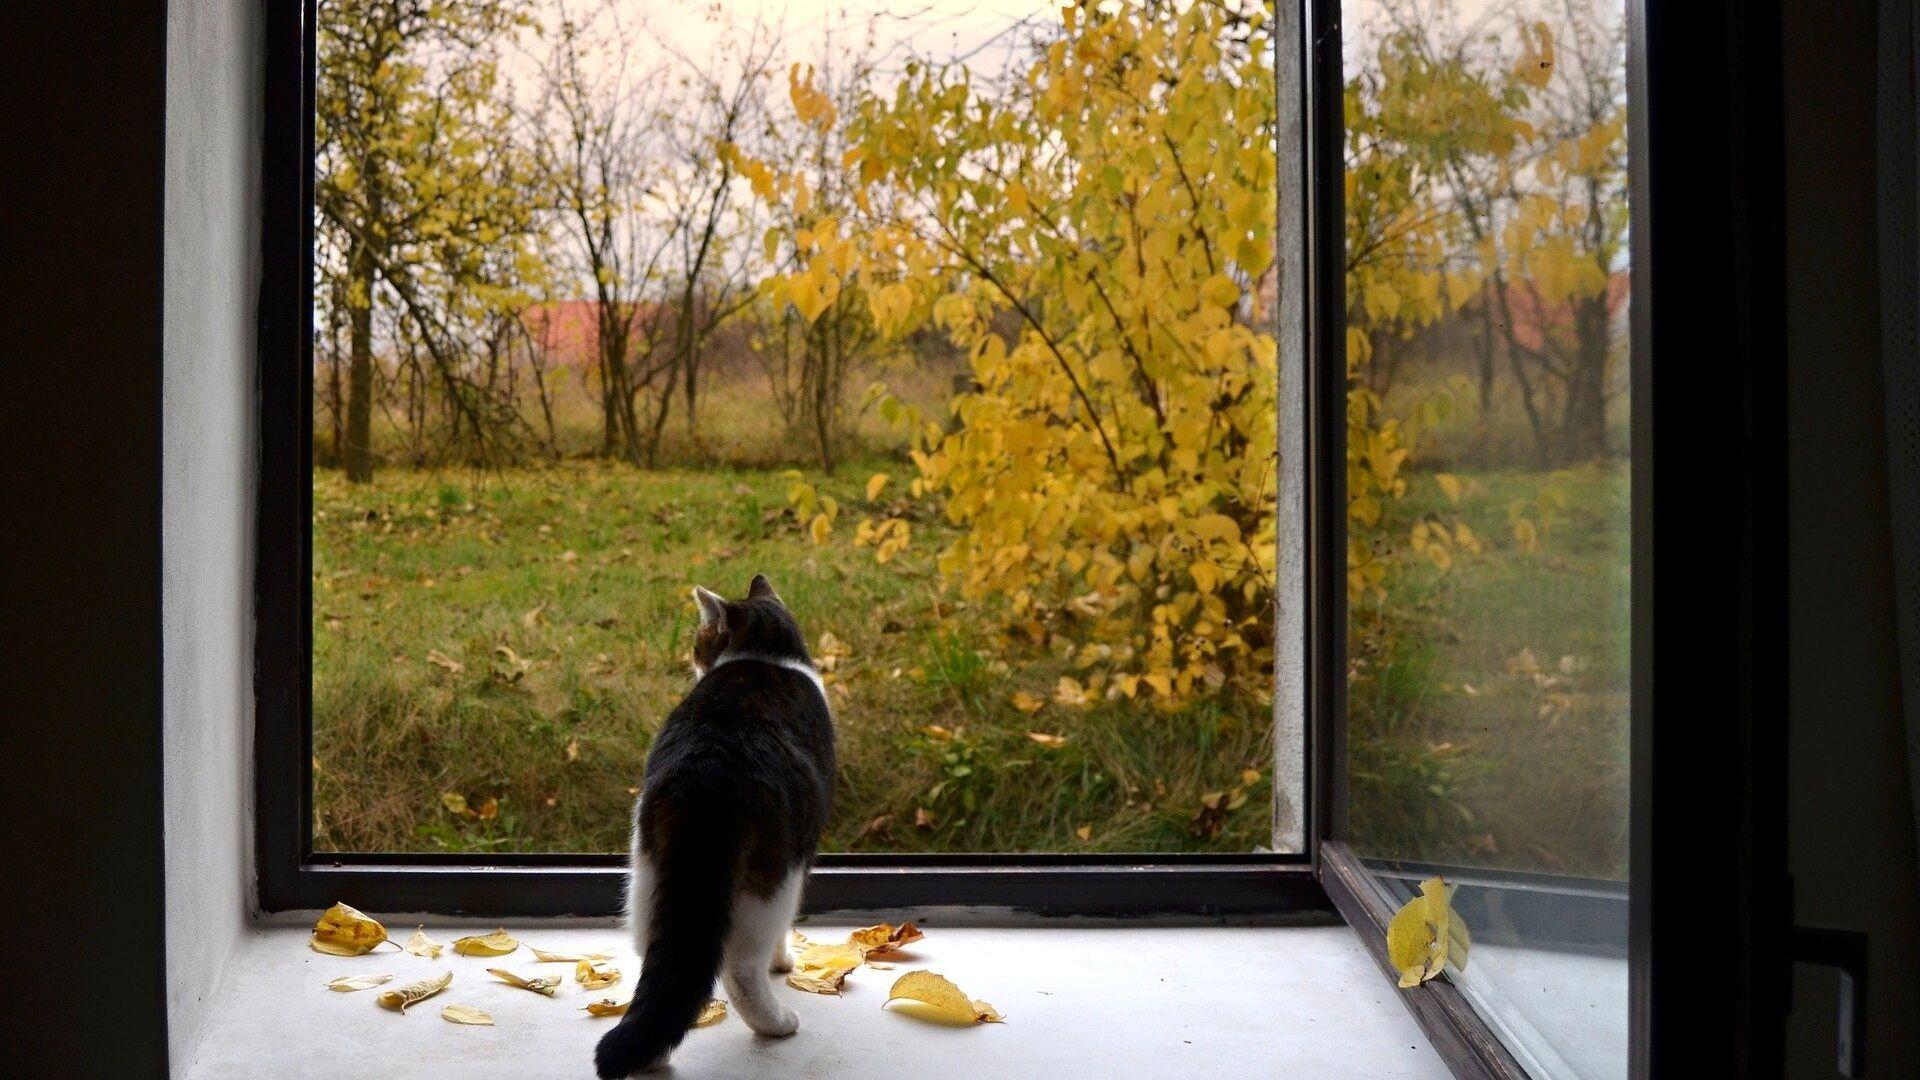 Кот на окне, архивное фото - Sputnik Беларусь, 1920, 22.09.2021